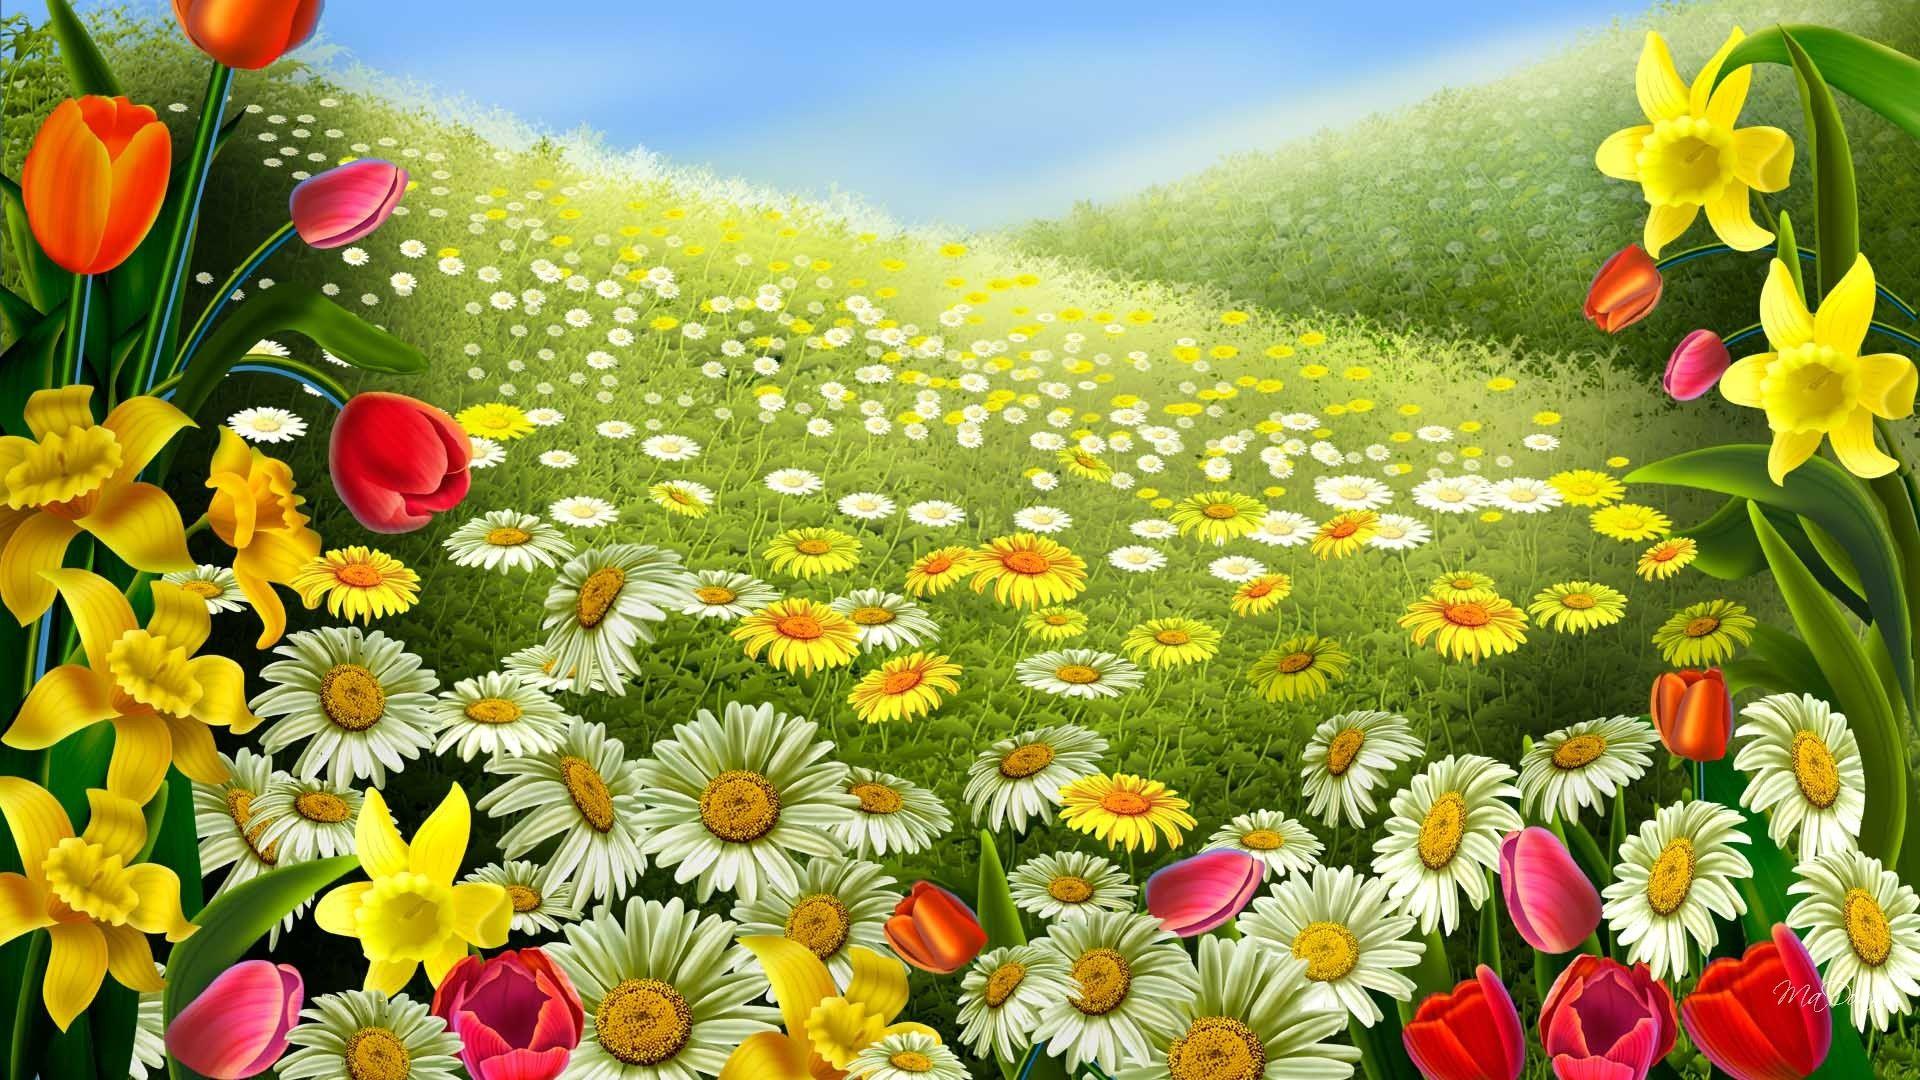 Spring Flowers Wallpapers Beautiful Flowers Images Spring Wallpaper Flower Images Wallpapers